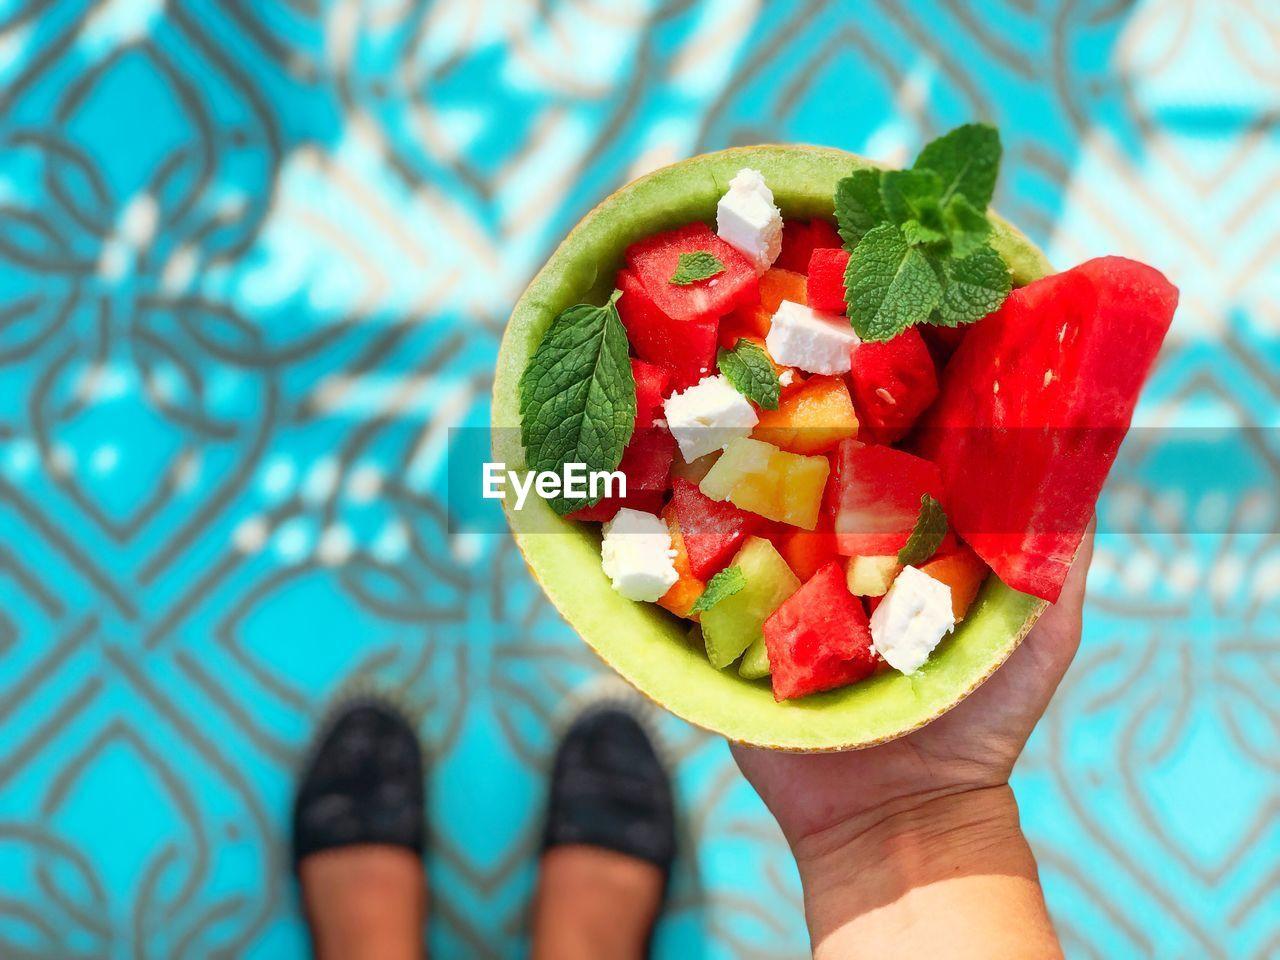 Cropped Hand Holding Fruit Salad